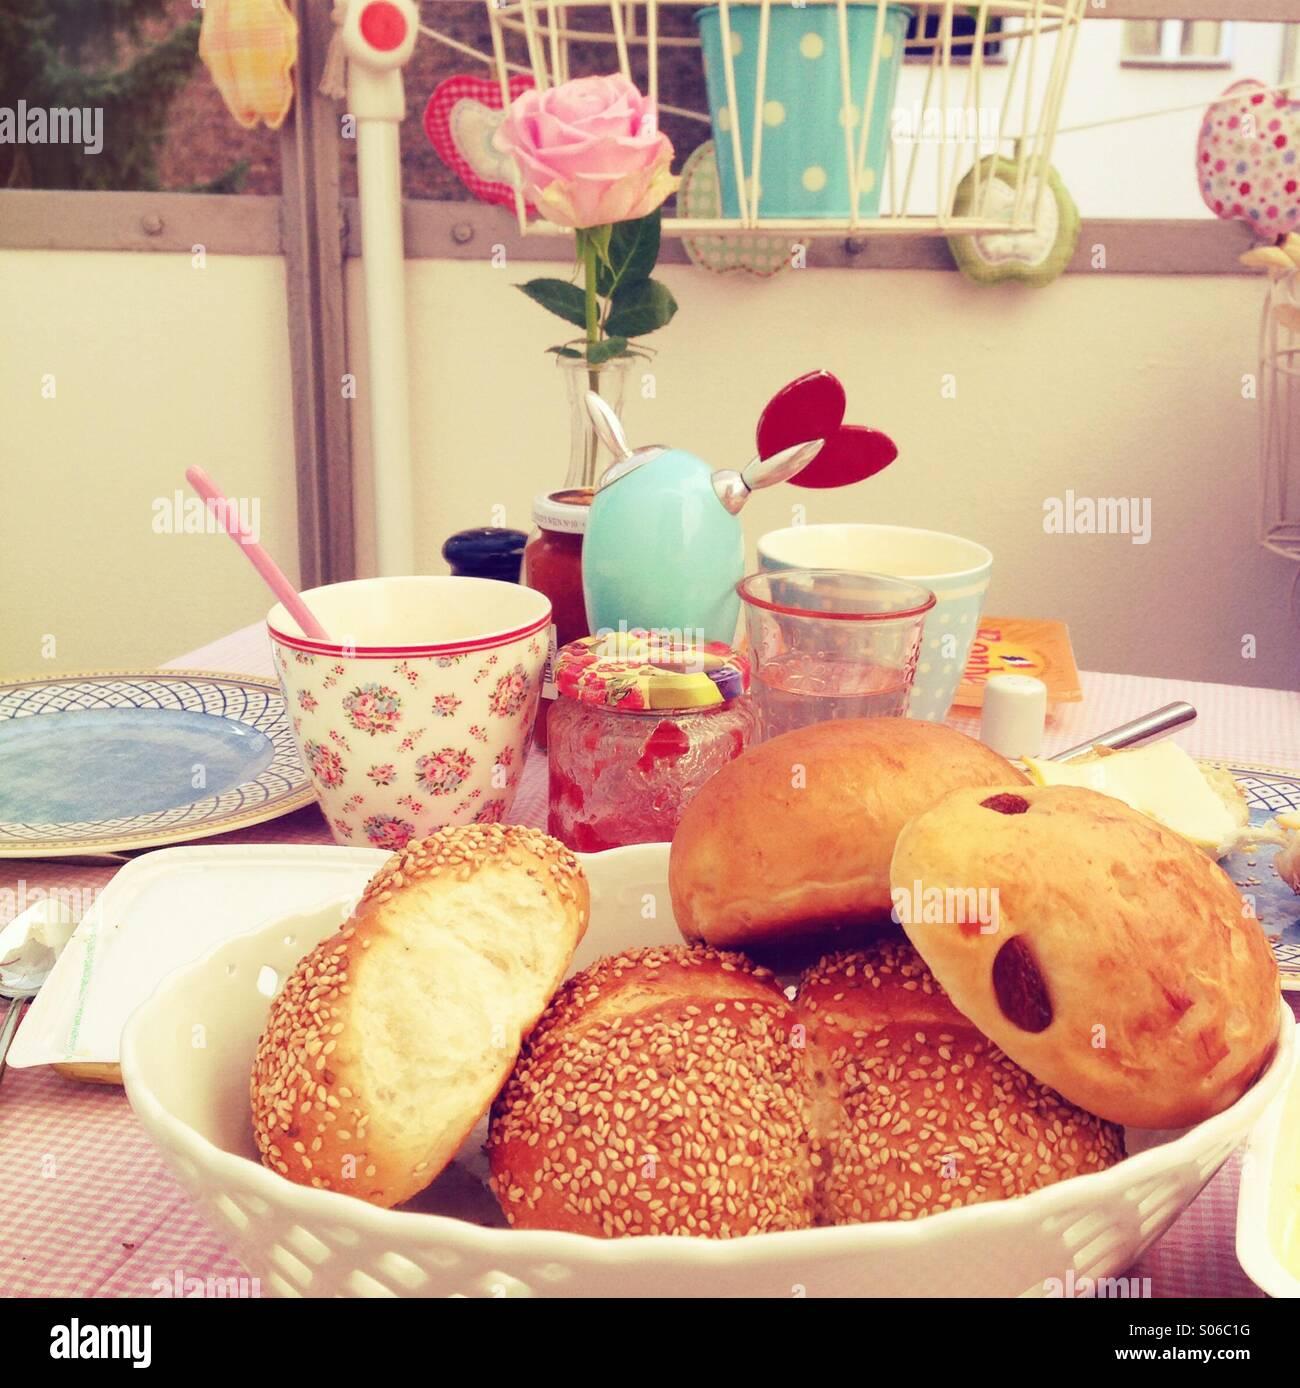 Frühstück auf dem Balkon - Stock Image